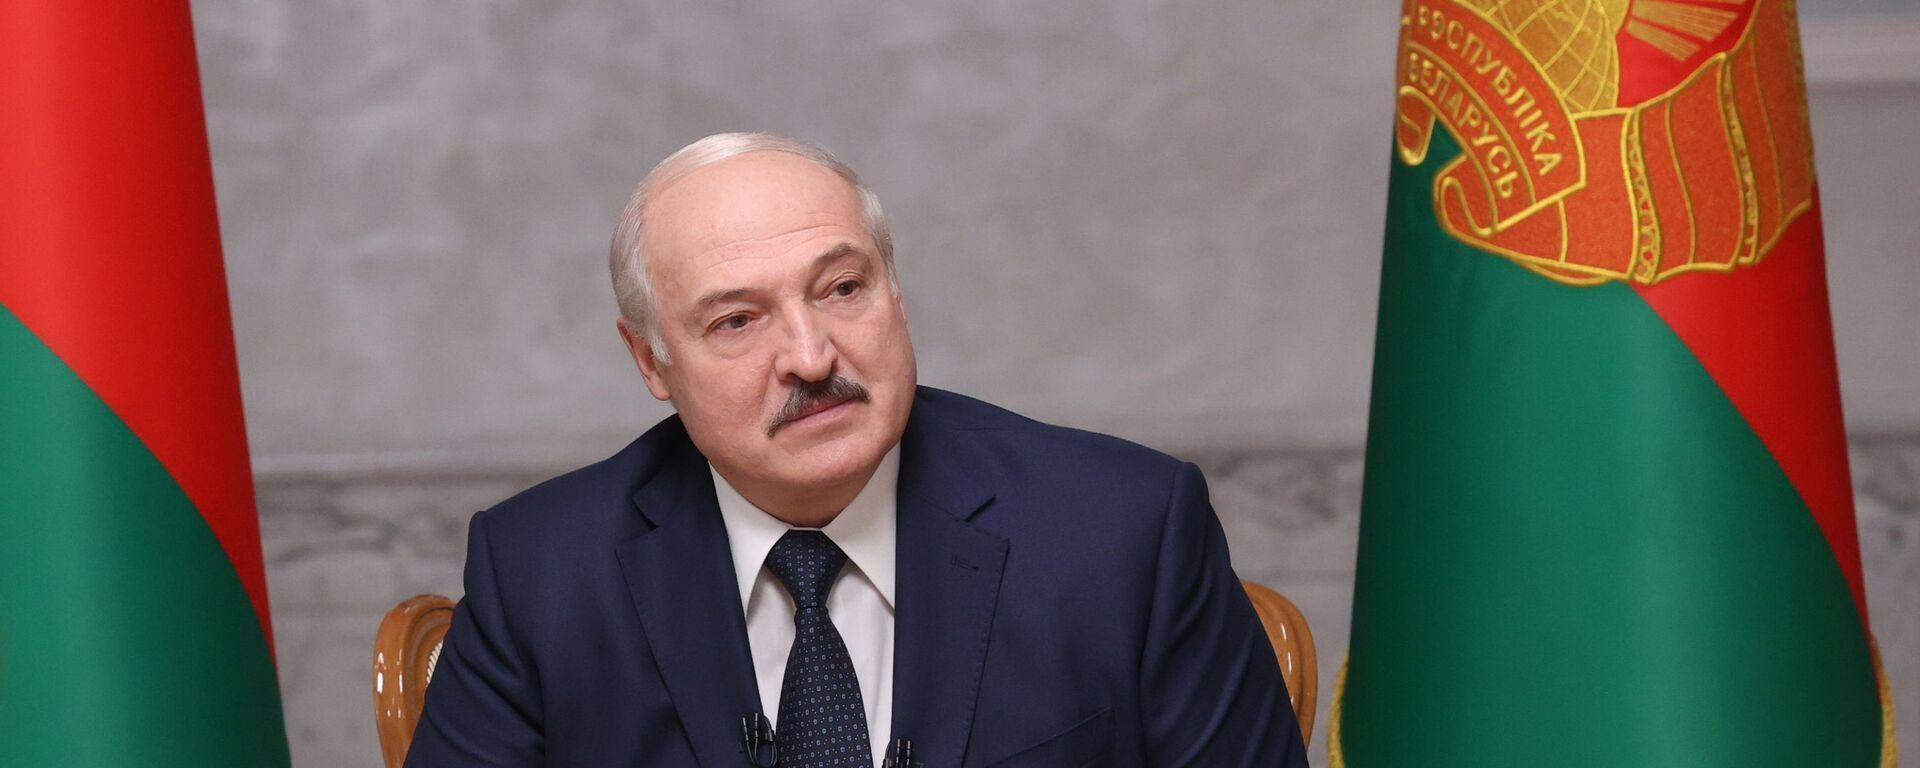 Аляксандр Лукашэнка - Sputnik Беларусь, 1920, 22.10.2020